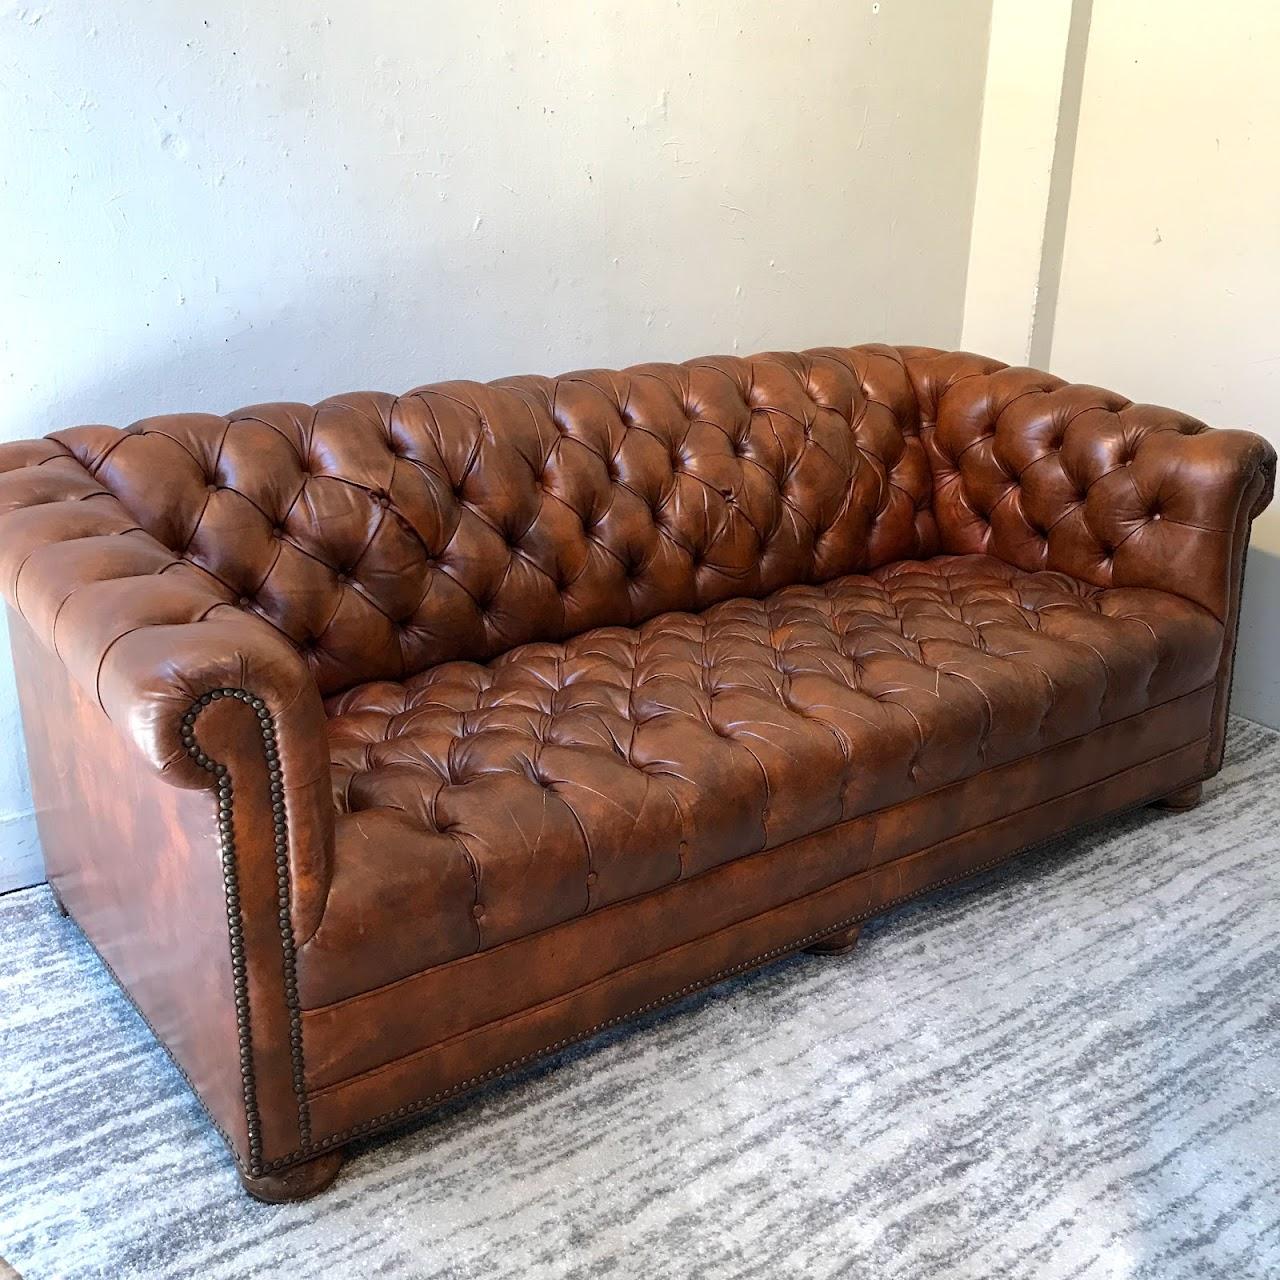 Leather Chesterfield Sofa Shophousingworks